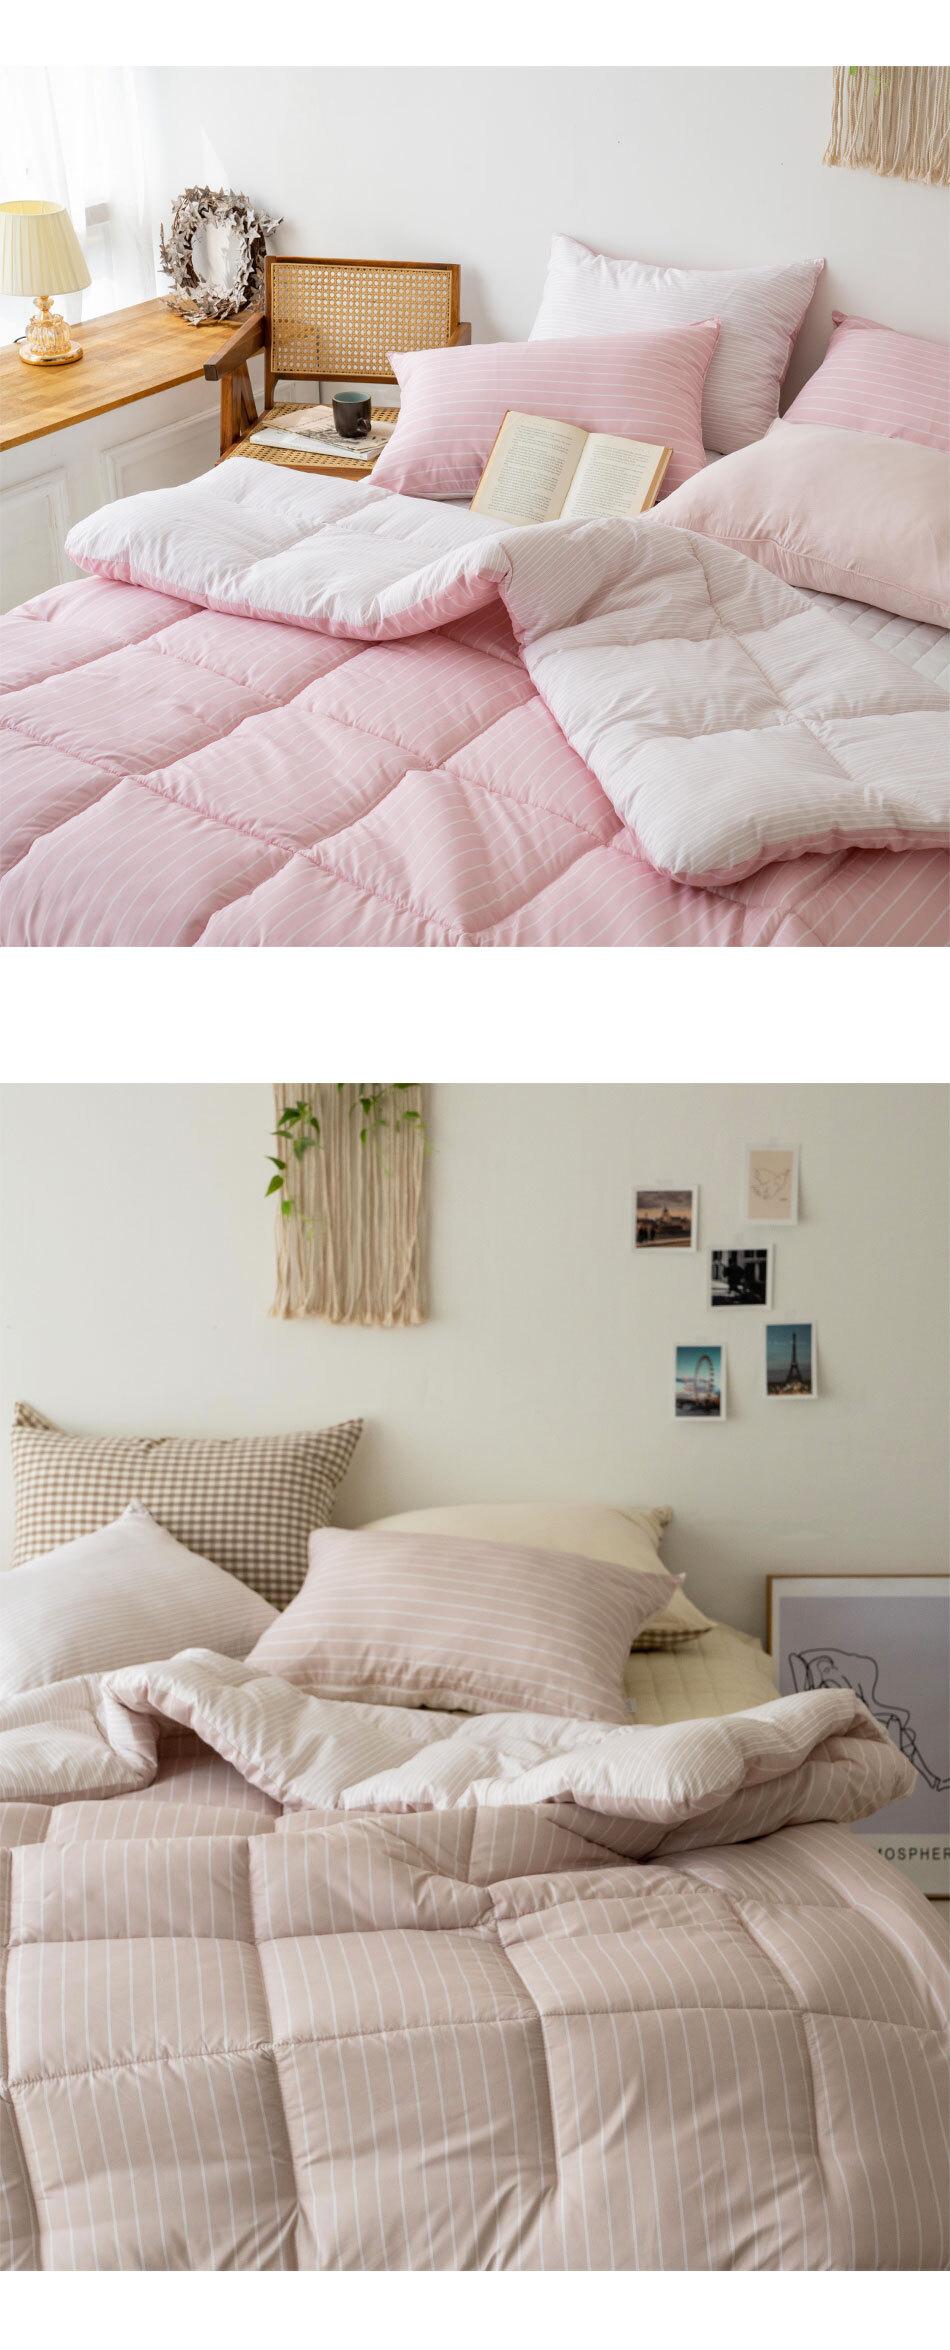 urban_bed_01.jpg